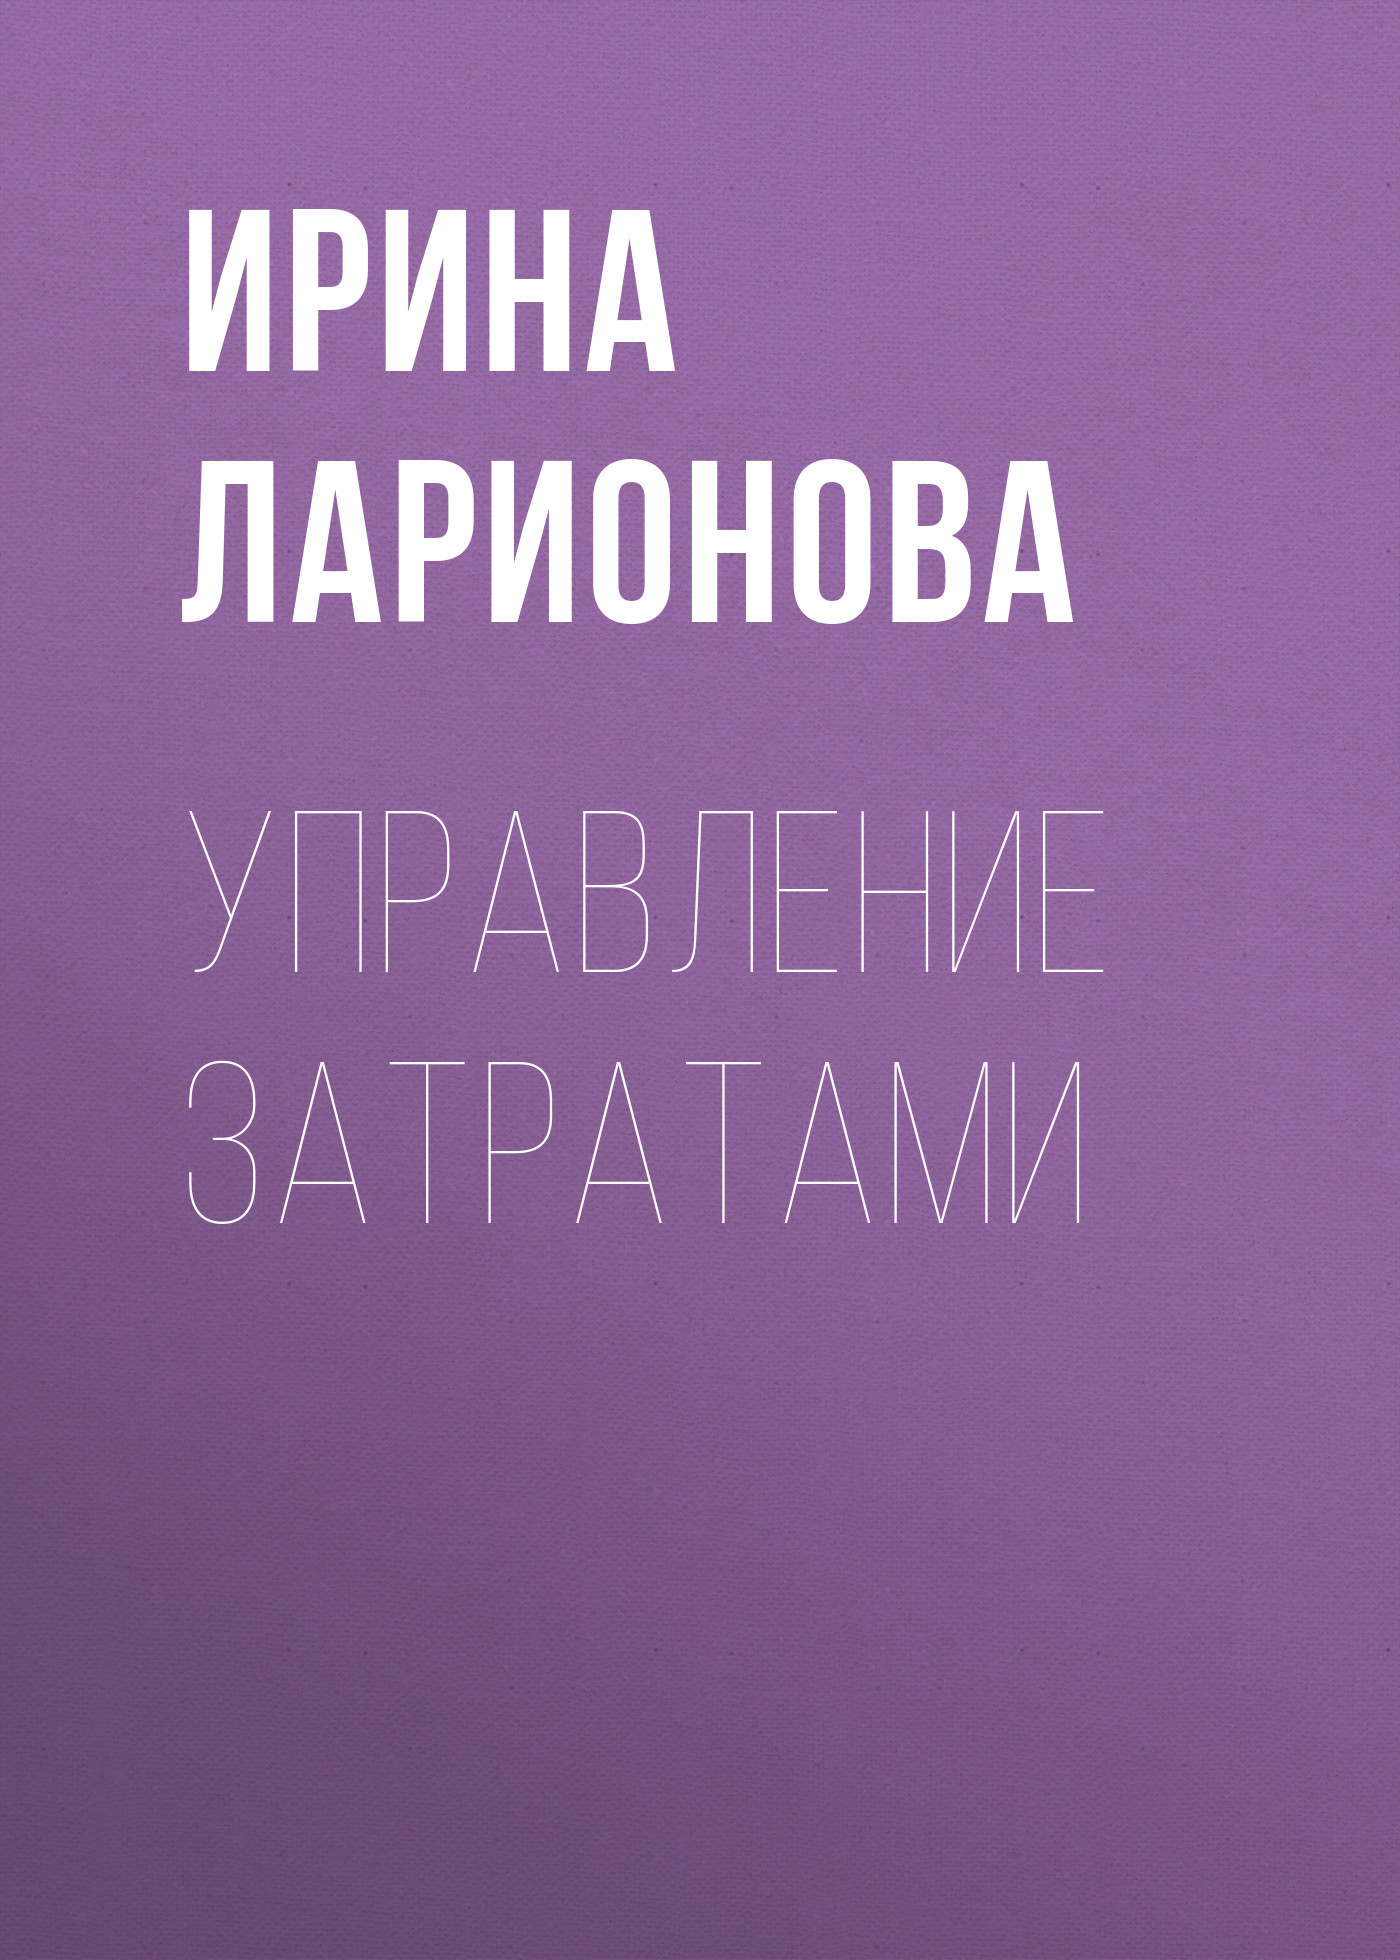 Ирина Ларионова бесплатно